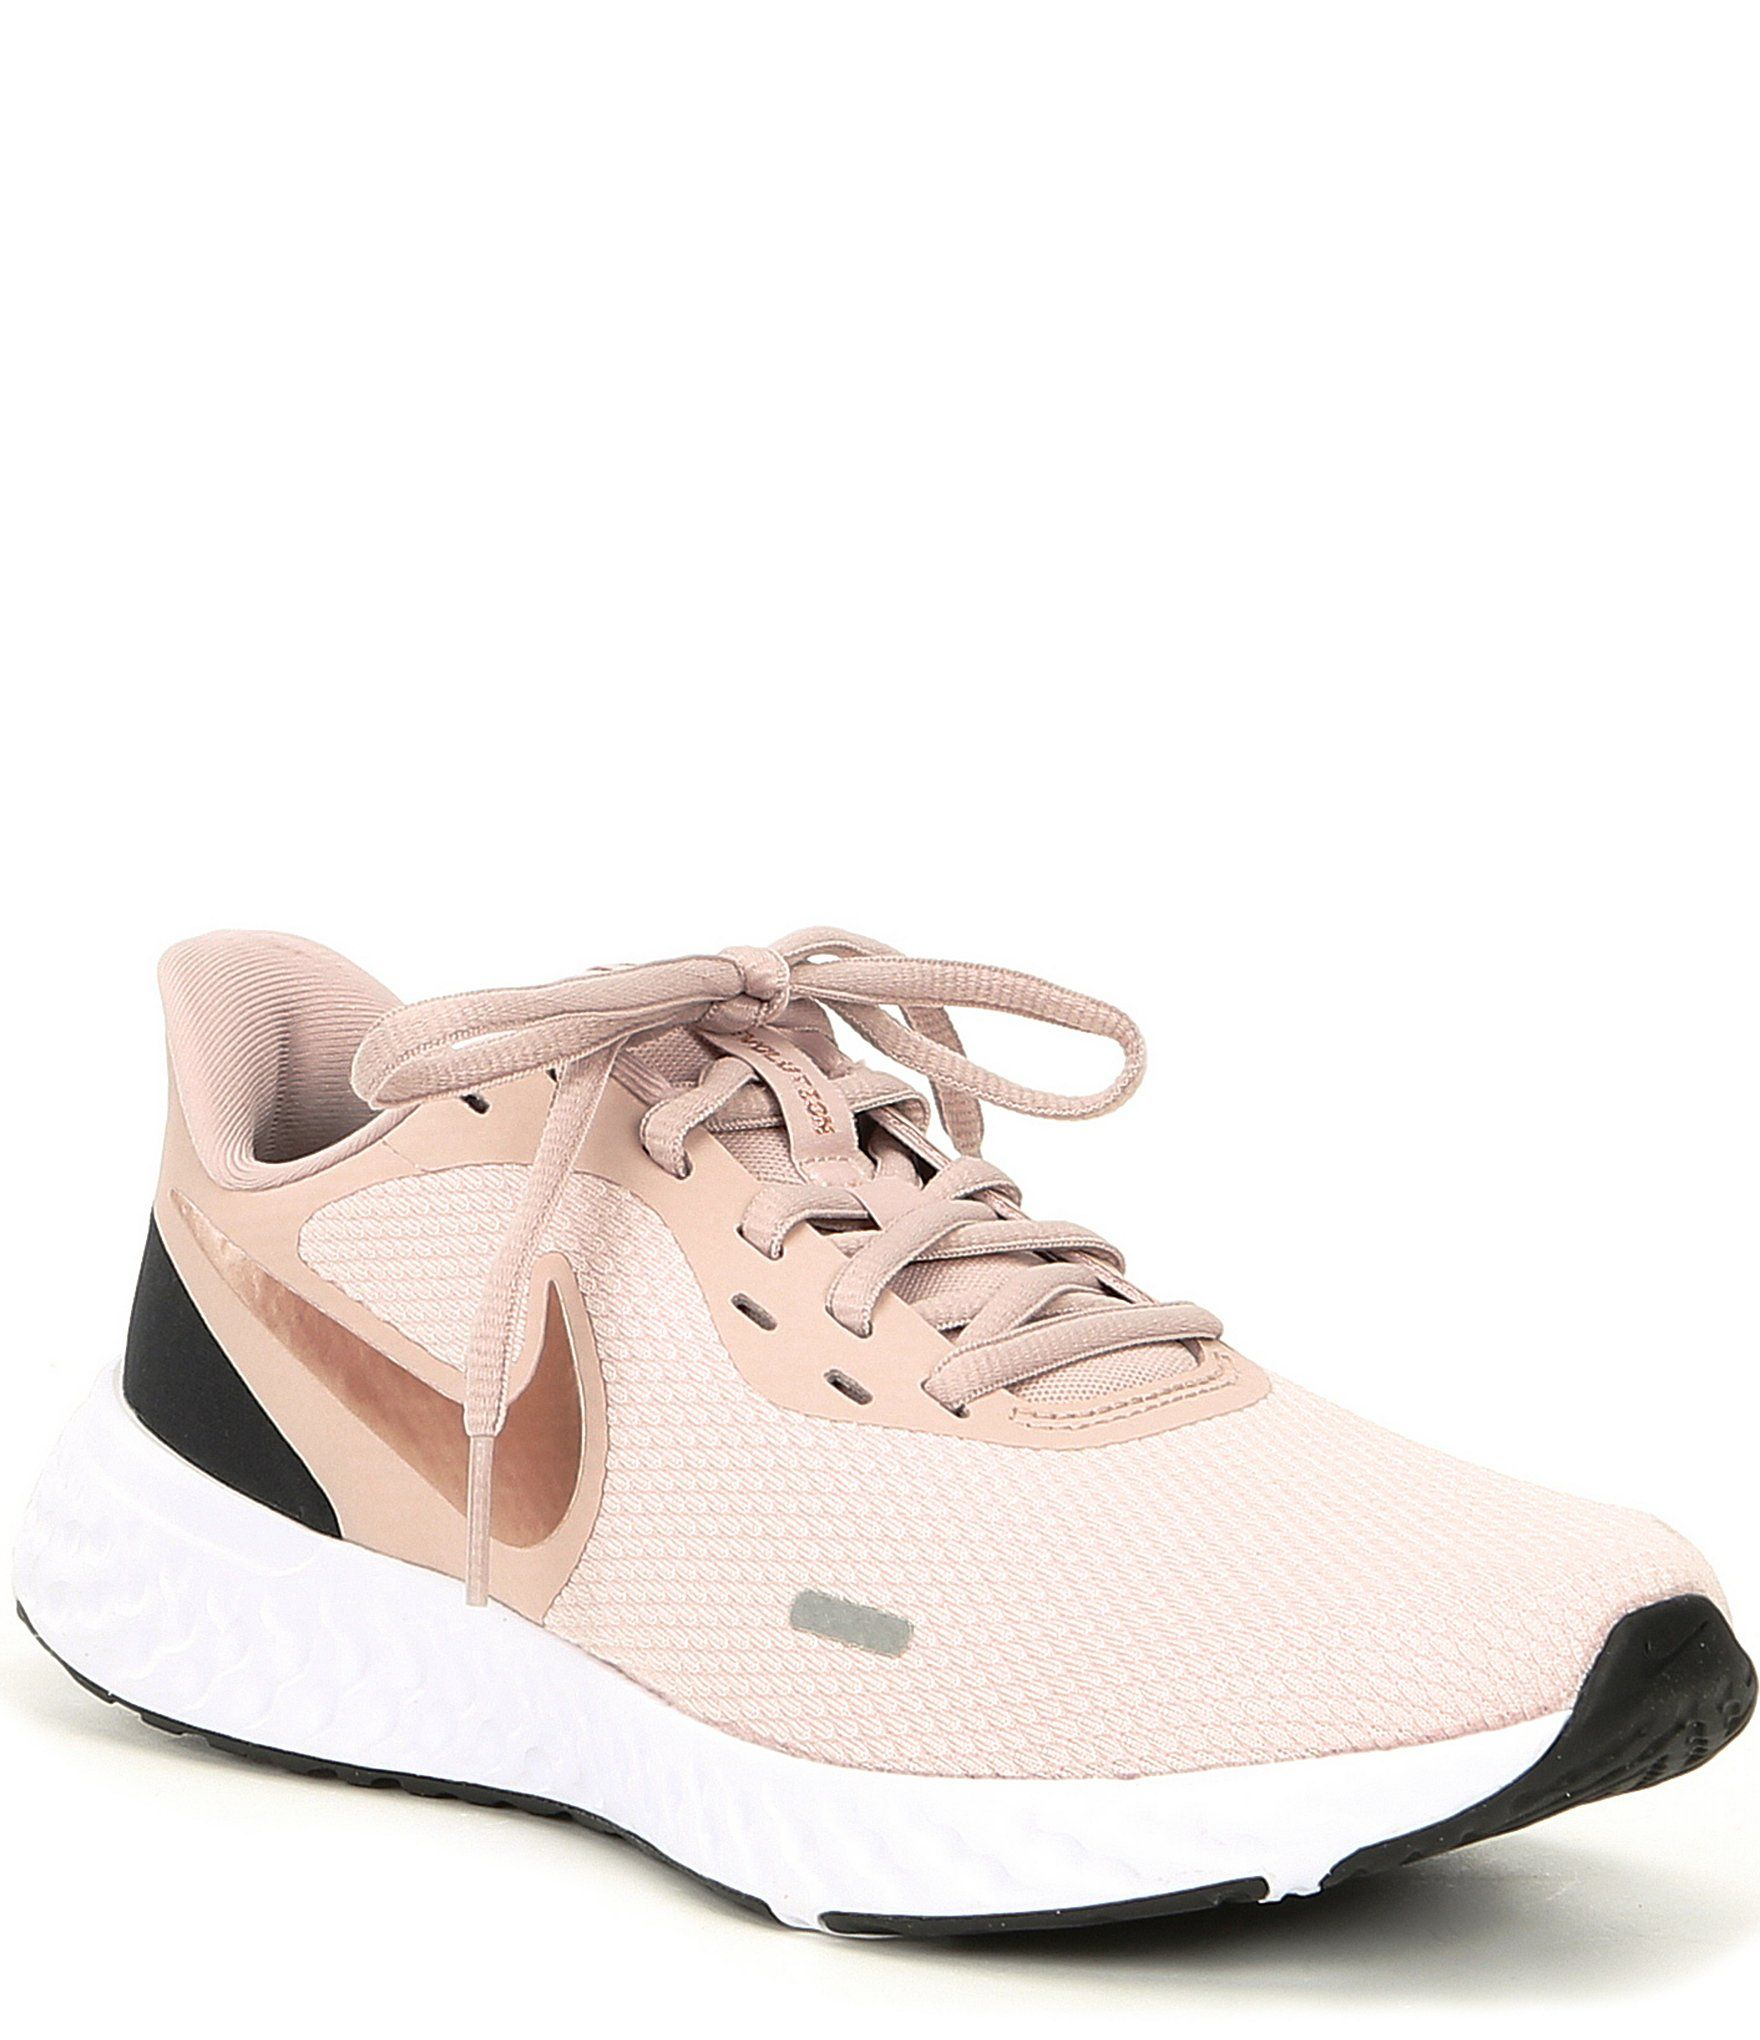 Women Nike Shoes Academy on Poshmark